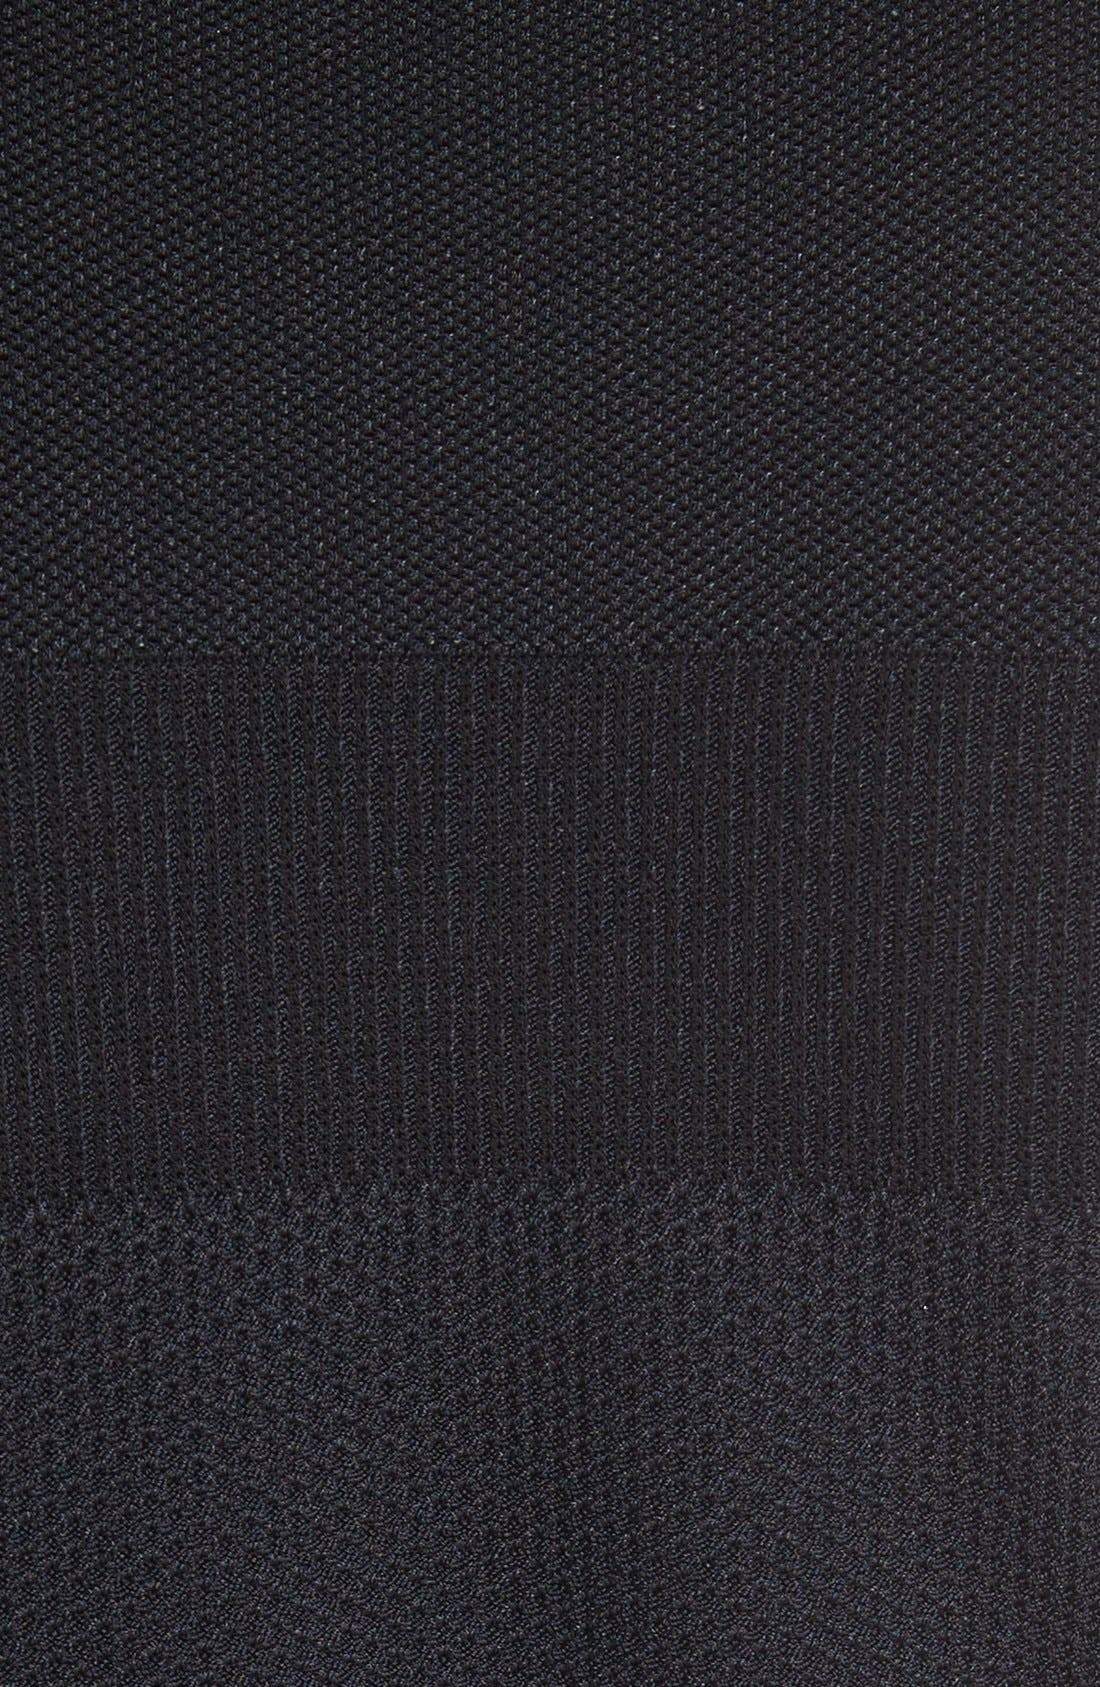 Alternate Image 3  - Proenza Schouler Crop Knit Top